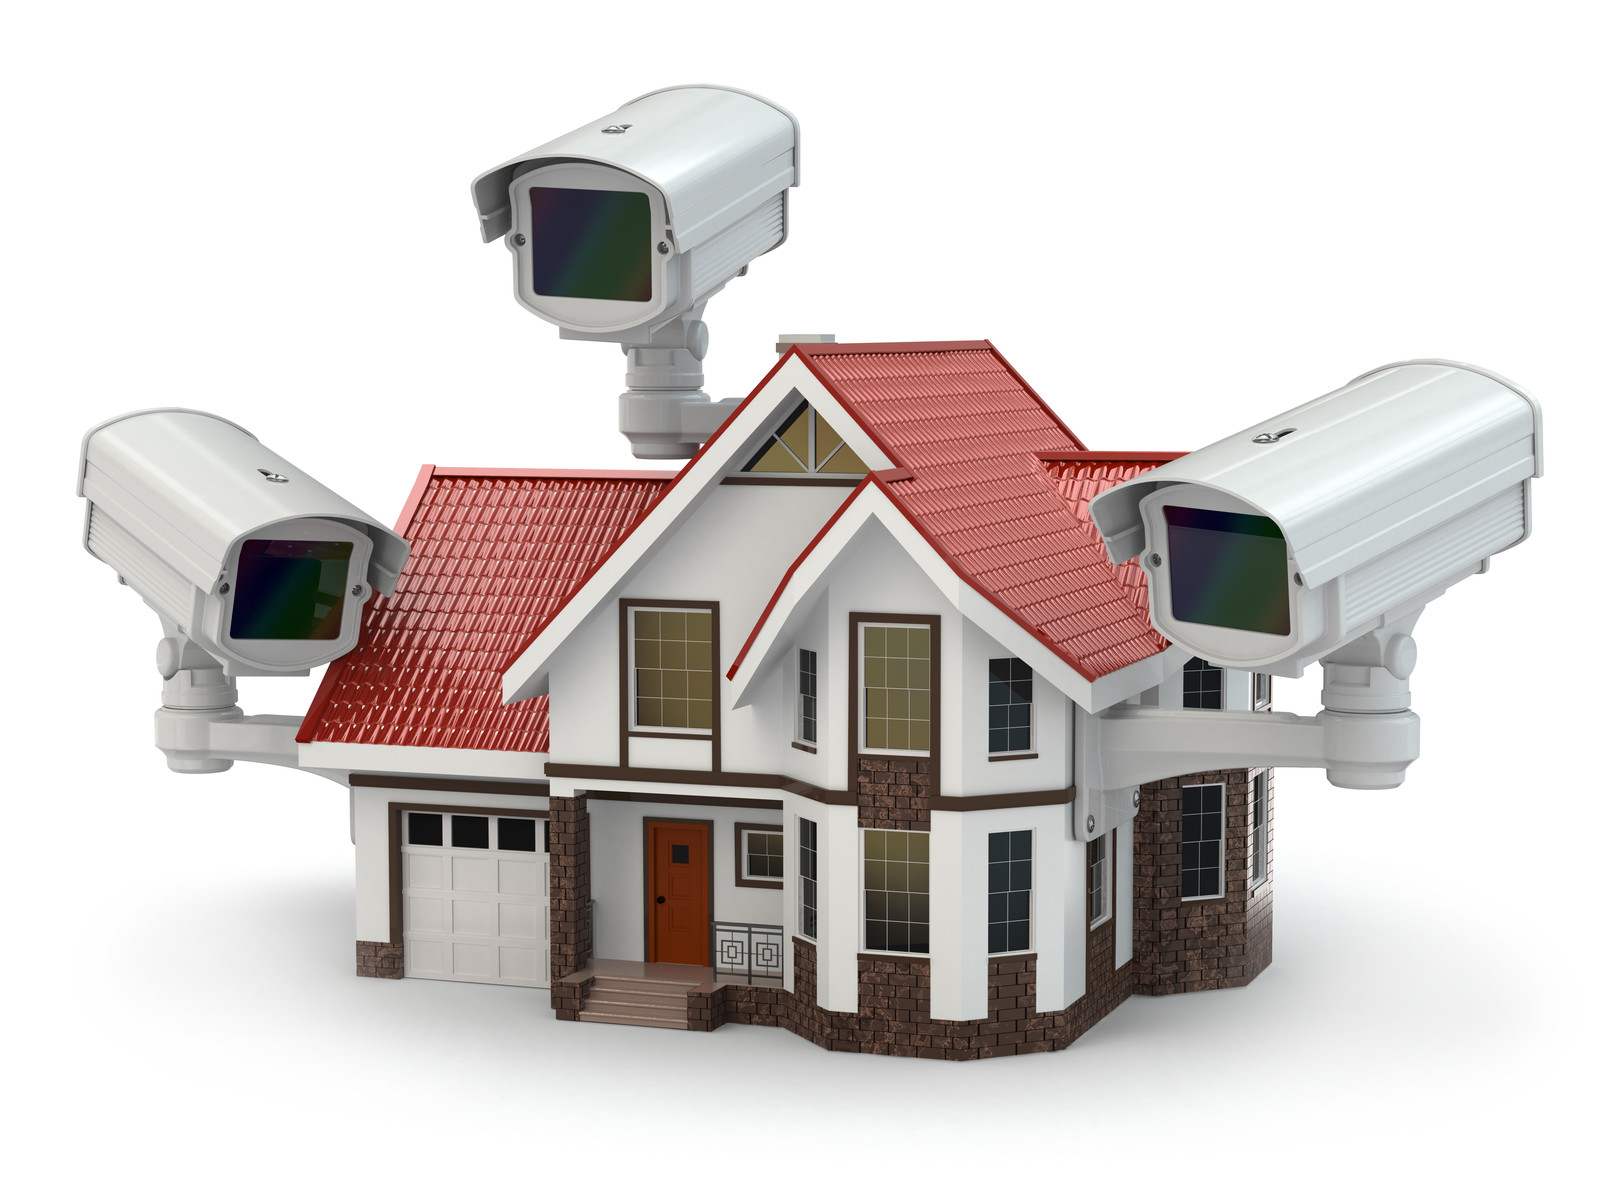 home security systems - Home Security Systems